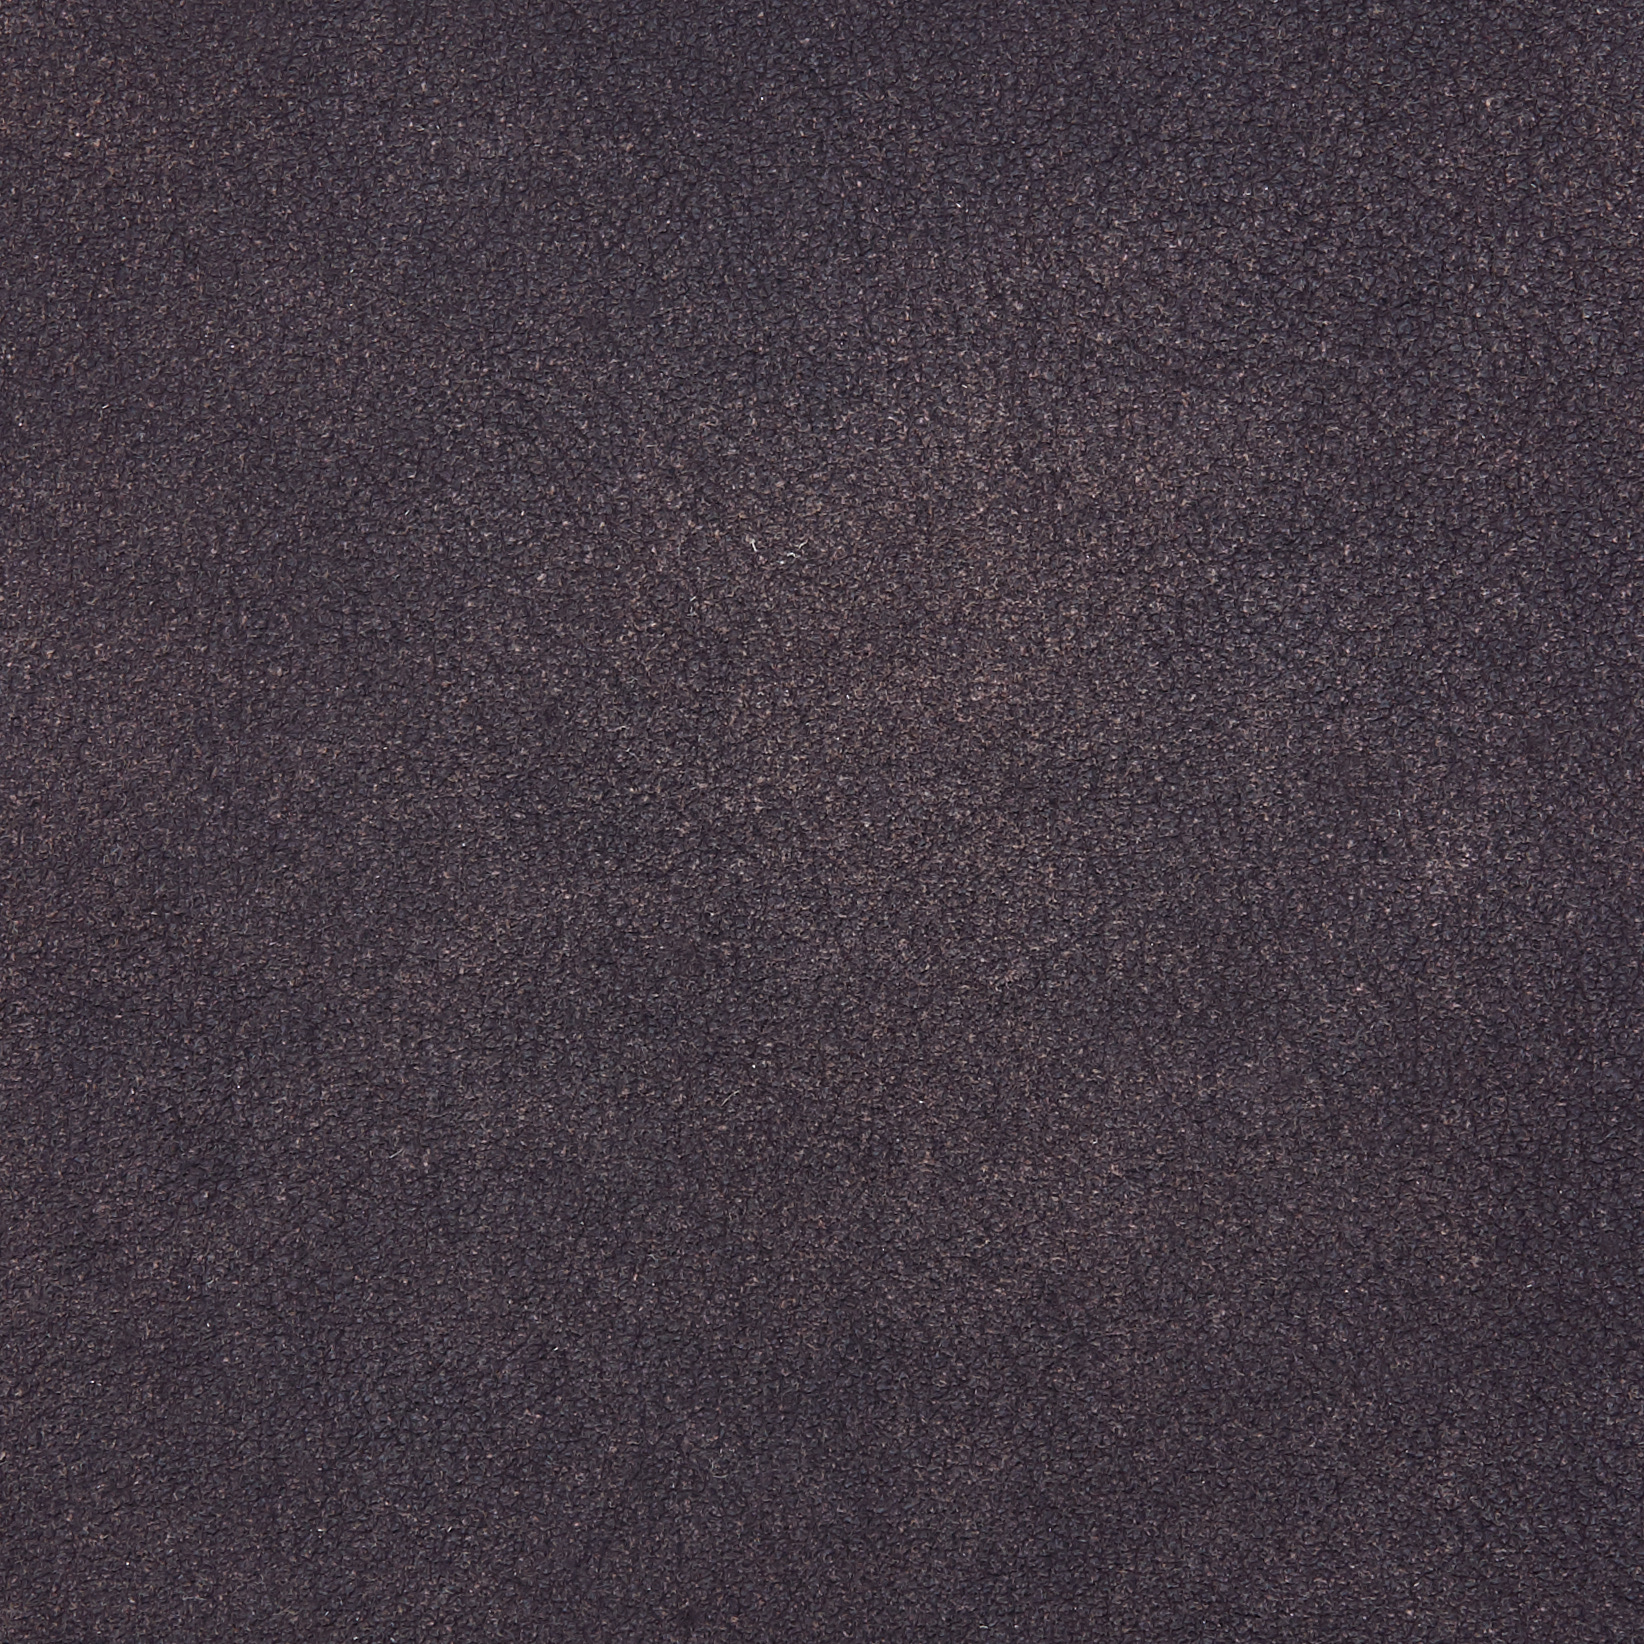 Merlot Leather